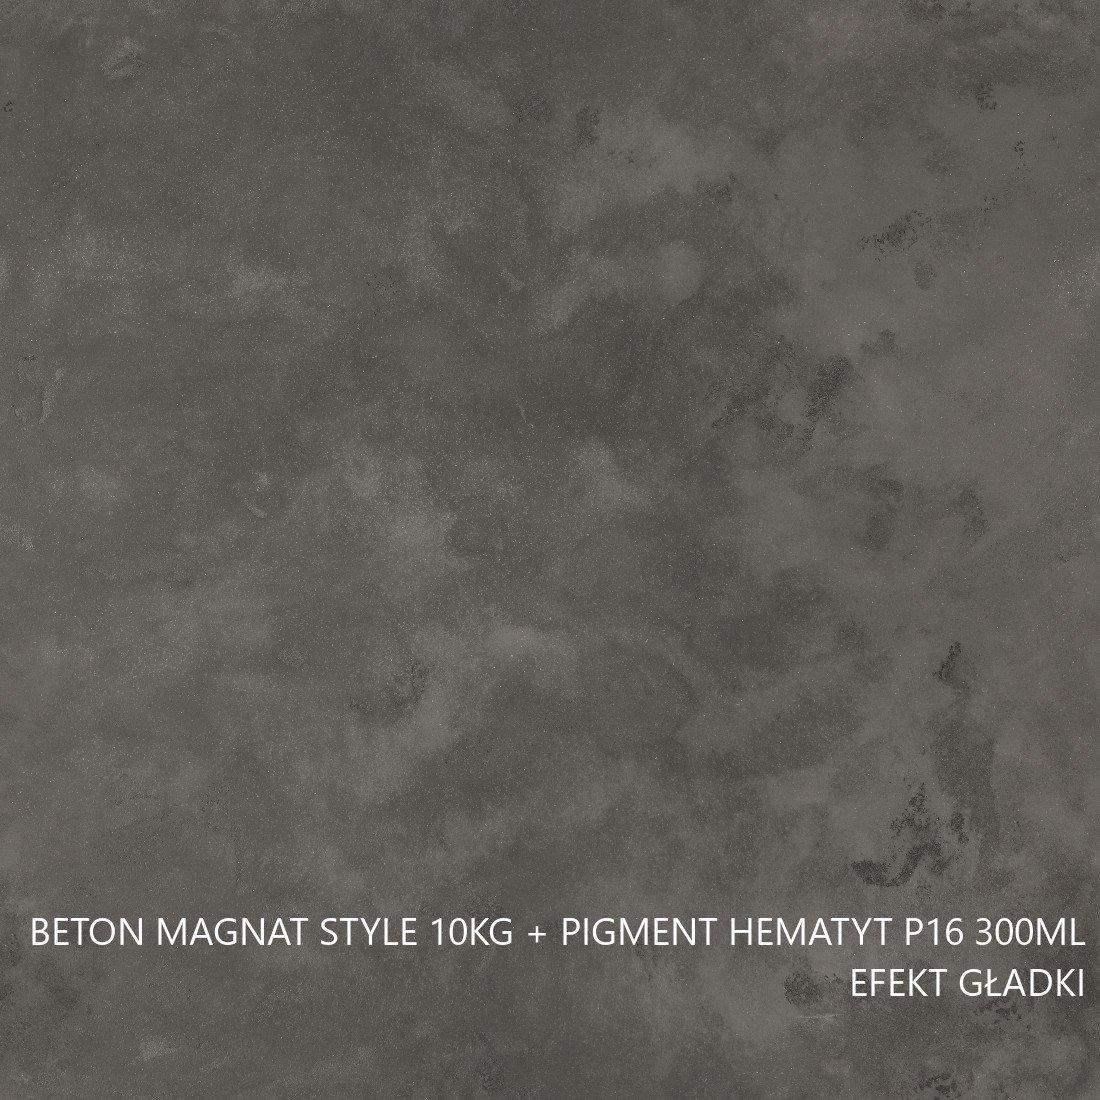 Beton Magnat Style Architektoniczny Dekoracyjny 1kg Super Cena